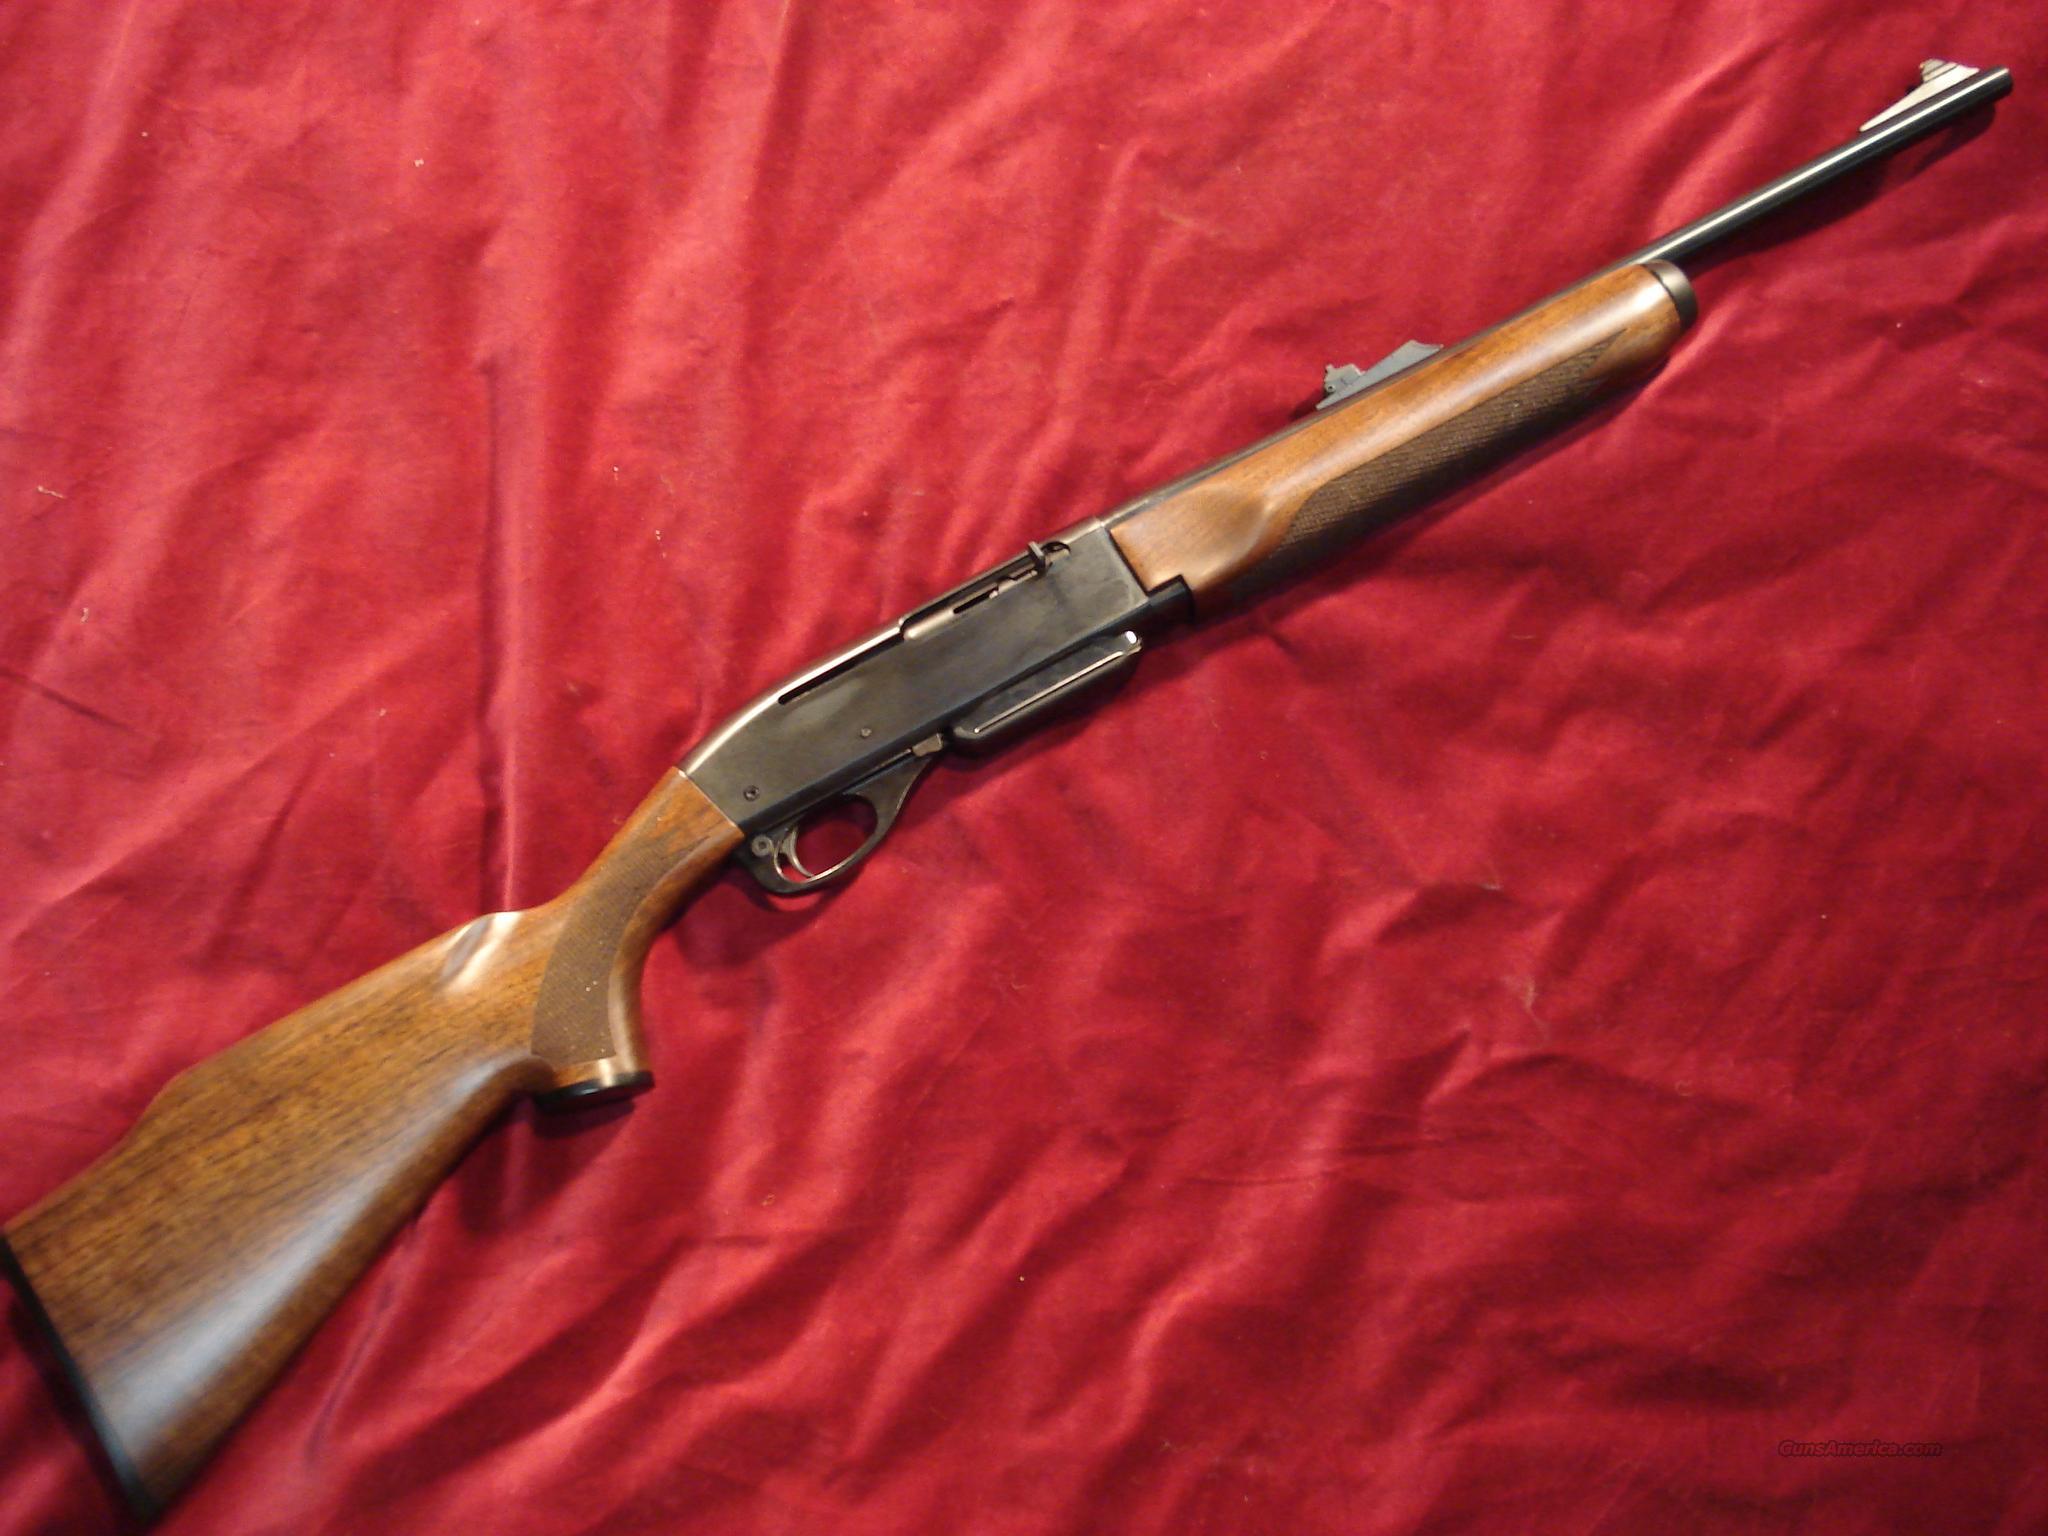 Remington 7400 carbine 30 06 walnut new for sale remington 7400 carbine 30 06 walnut new guns rifles remington rifles modern sciox Choice Image